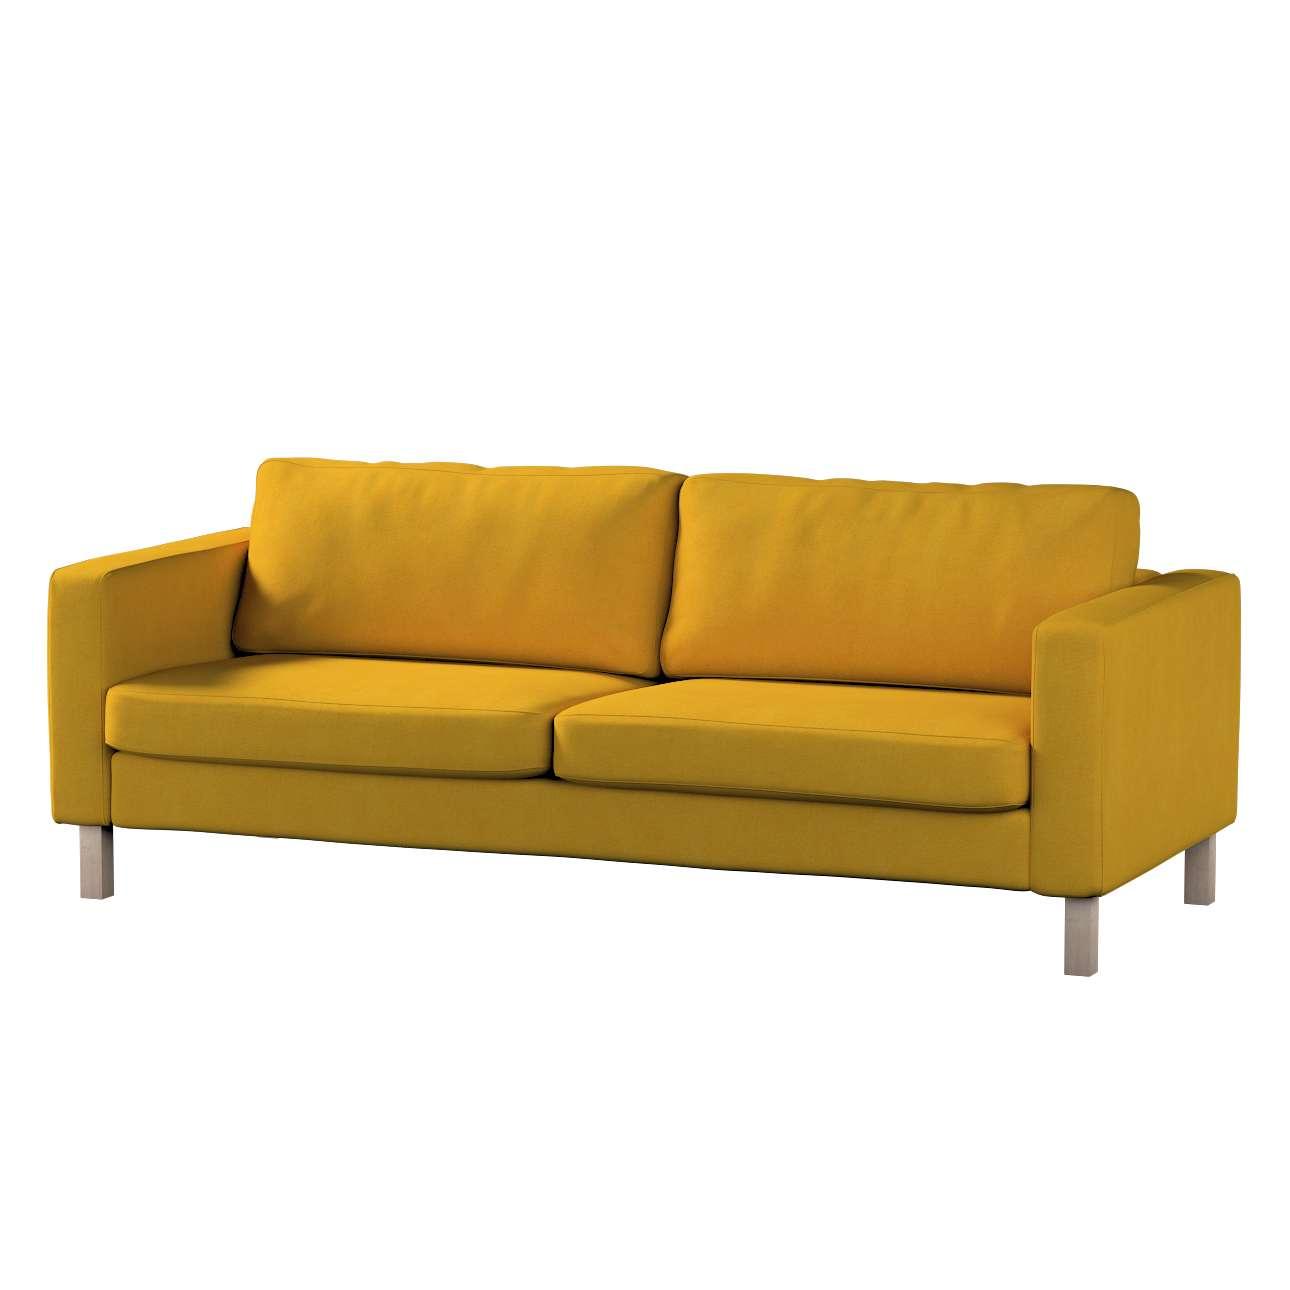 KARSLTAD trvivietės sofos užvalkalas Karlstad 3-vietės sofos užvalkalas (neišlankstomai sofai) kolekcijoje Etna , audinys: 705-04